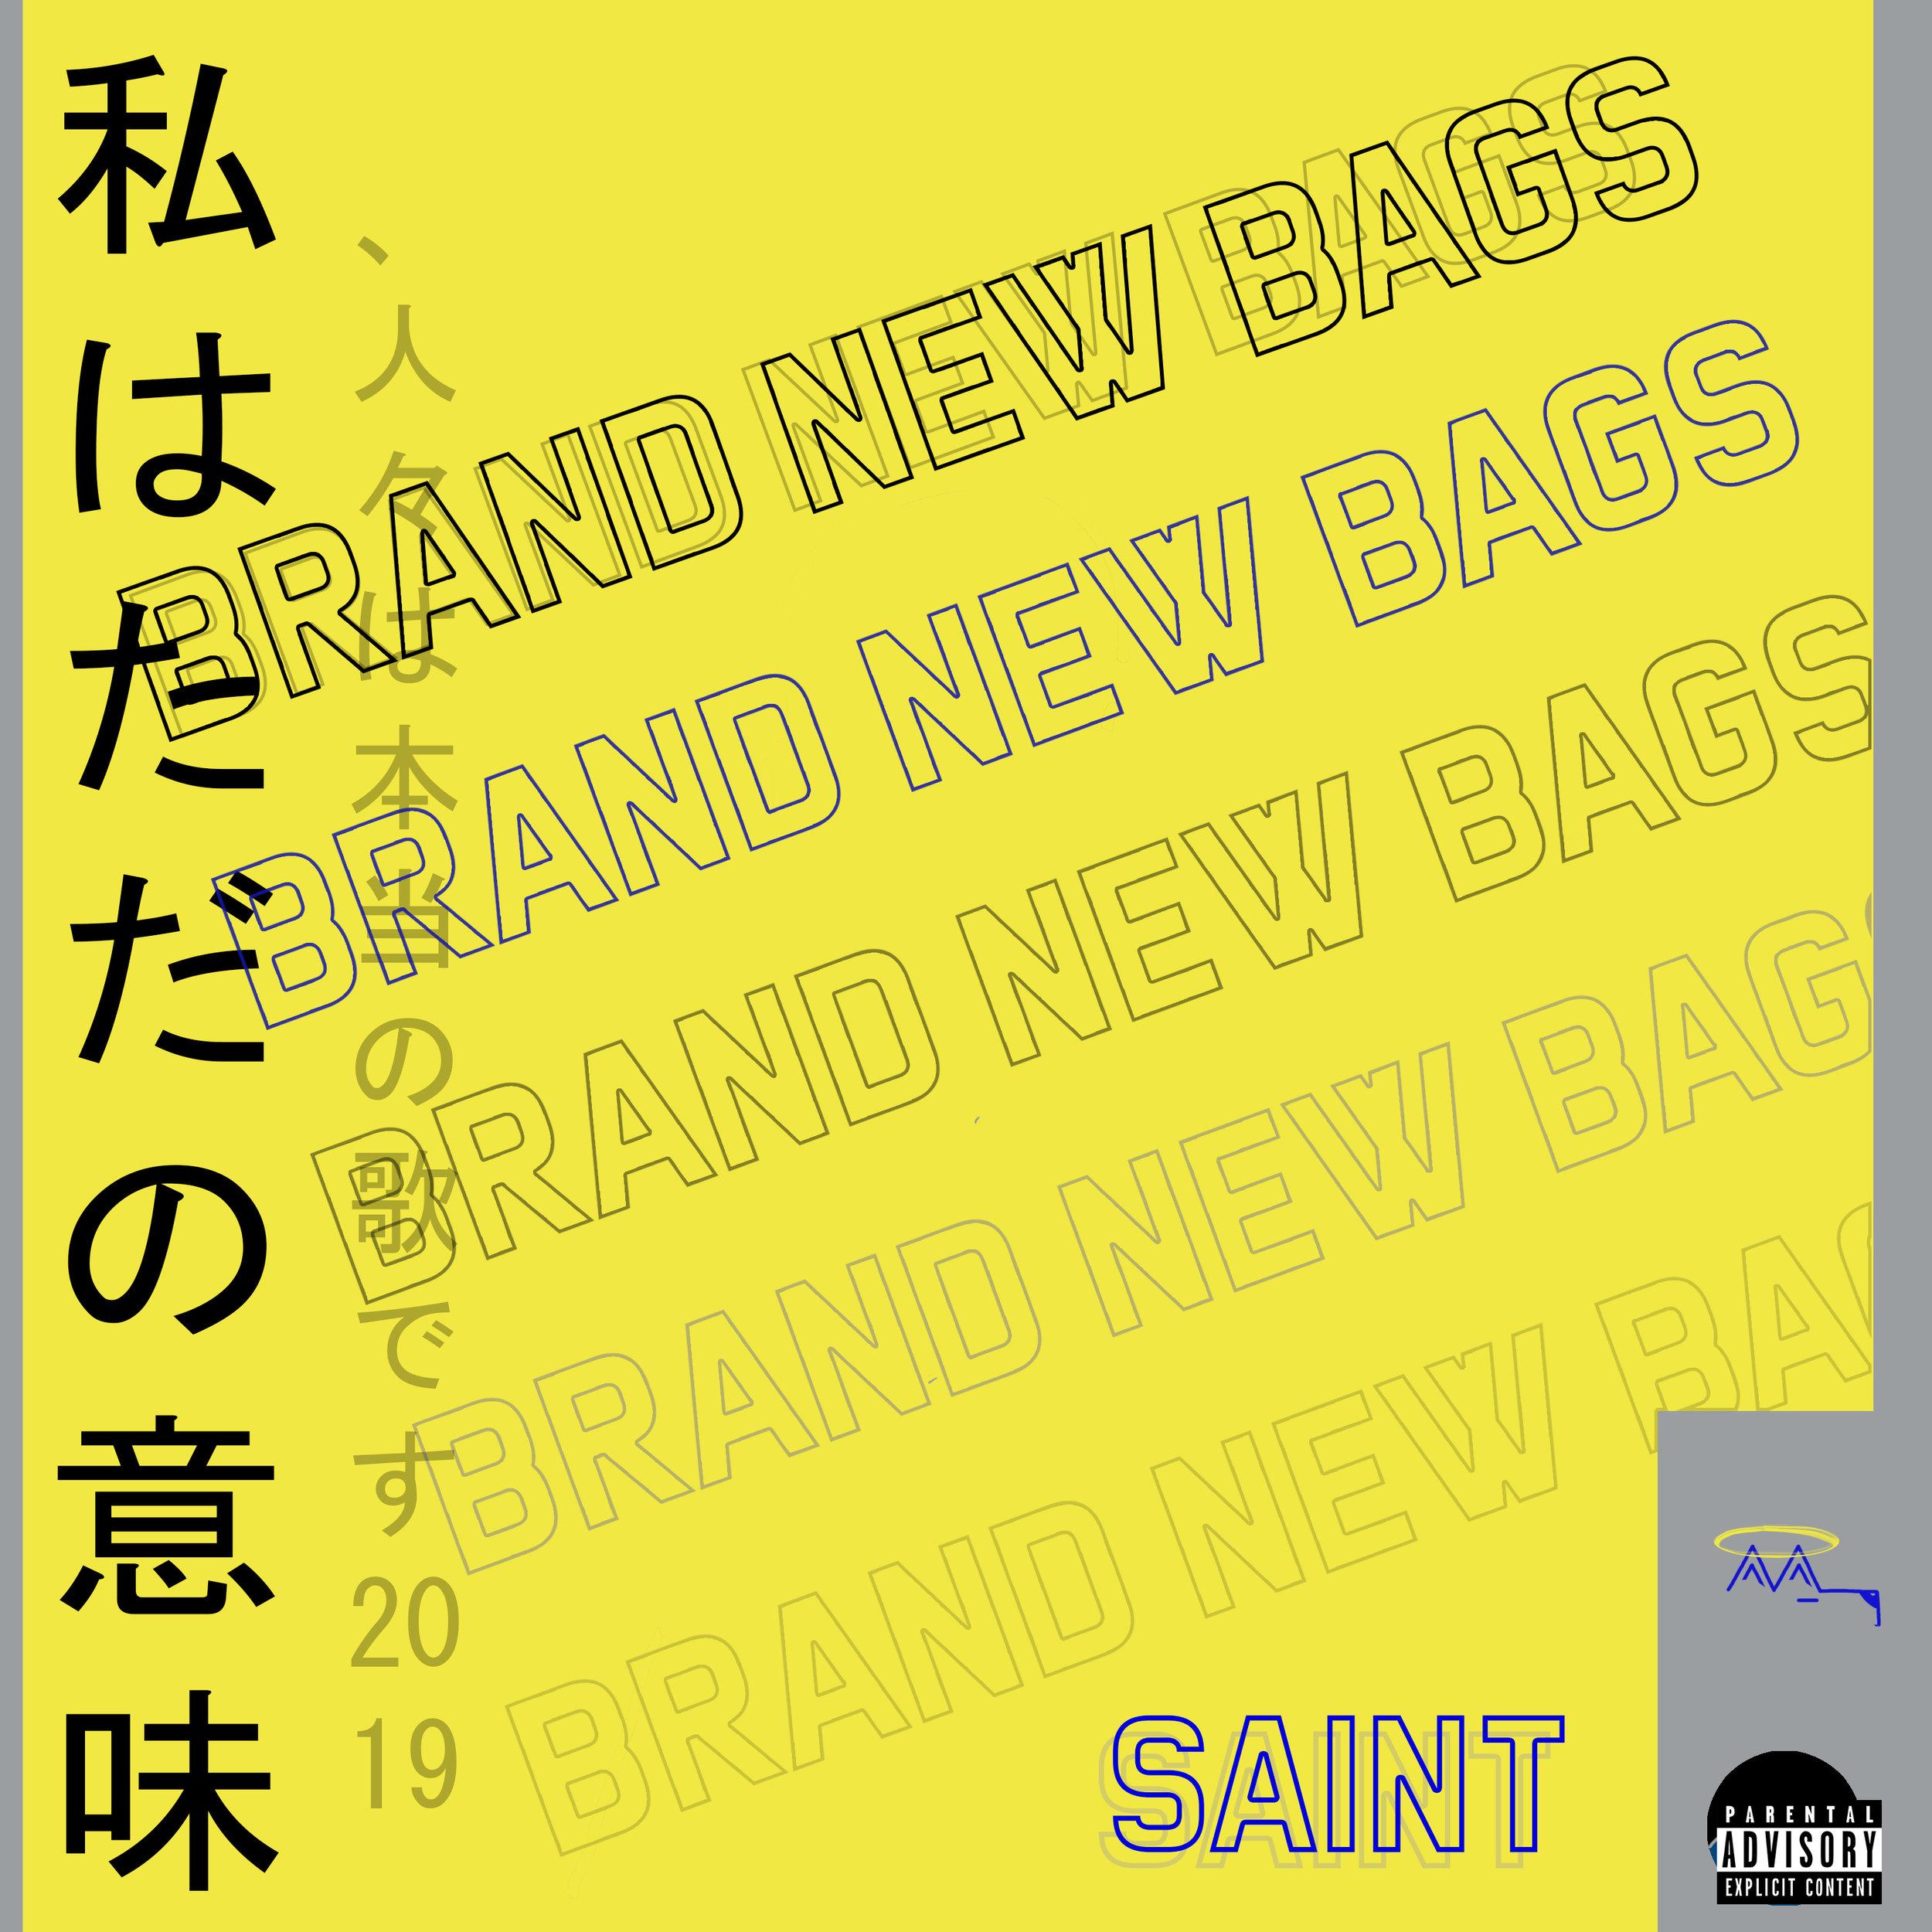 brand new bags cover 2.jpg